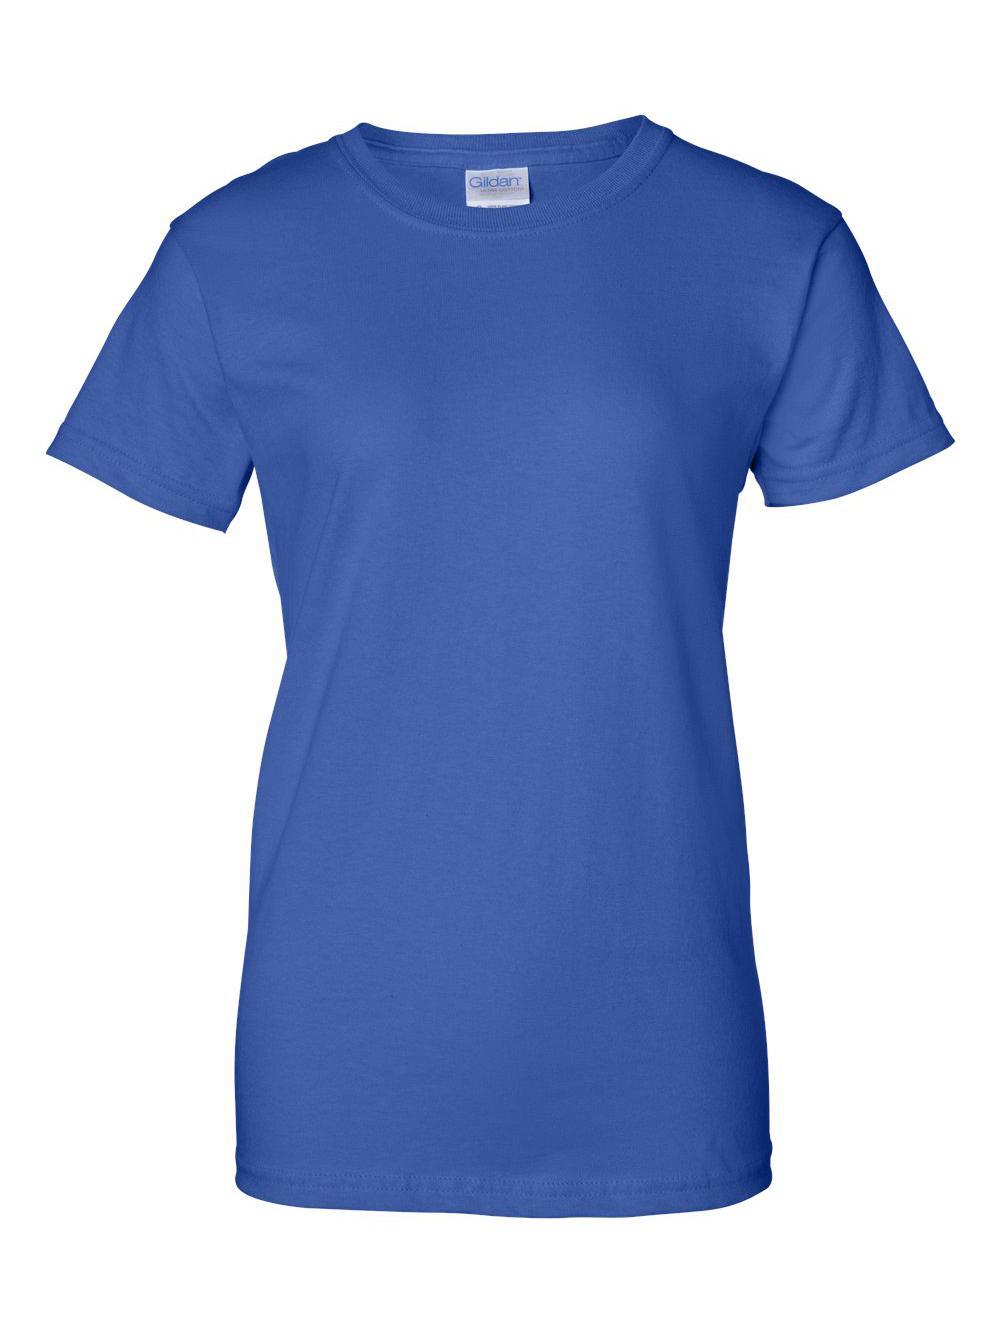 Gildan-Ultra-Cotton-Women-039-s-T-Shirt-2000L thumbnail 57